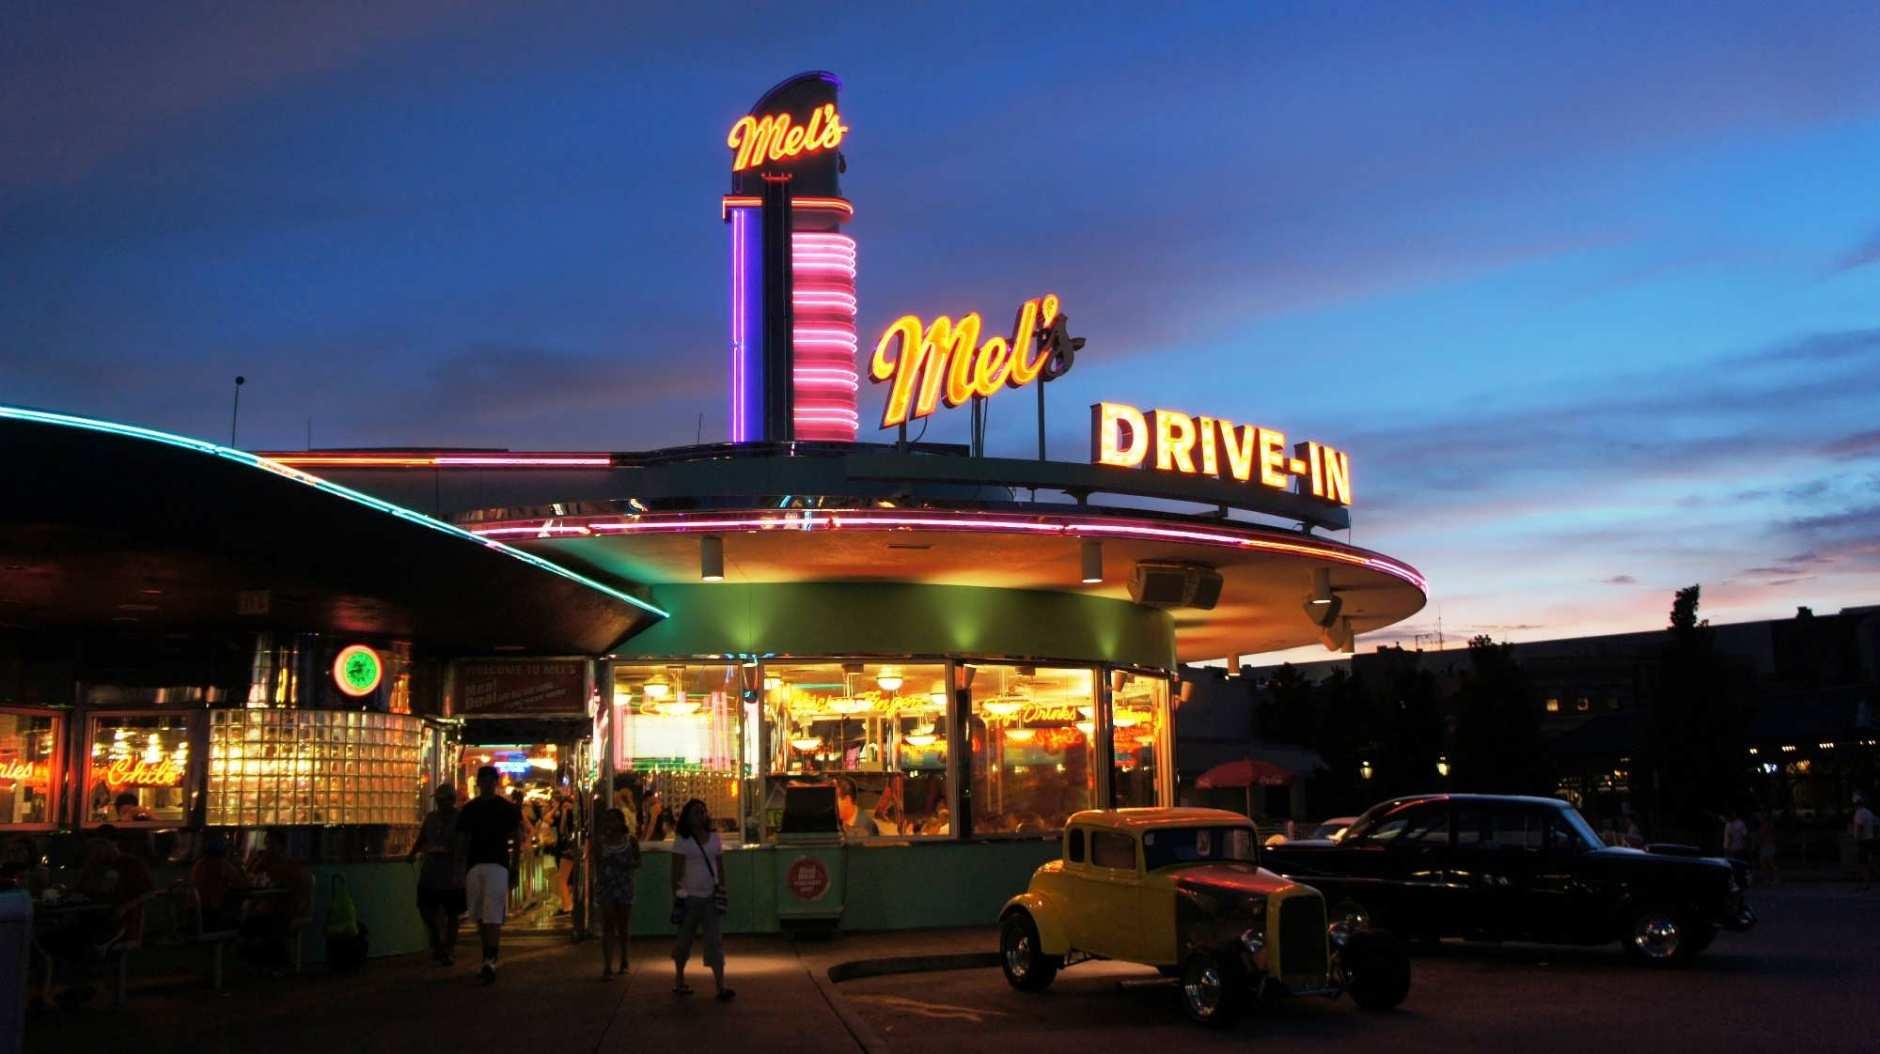 Un petit diner sur la route 66... Oi-universal-studios-florida-summer-concert-series-2011-717-orlando